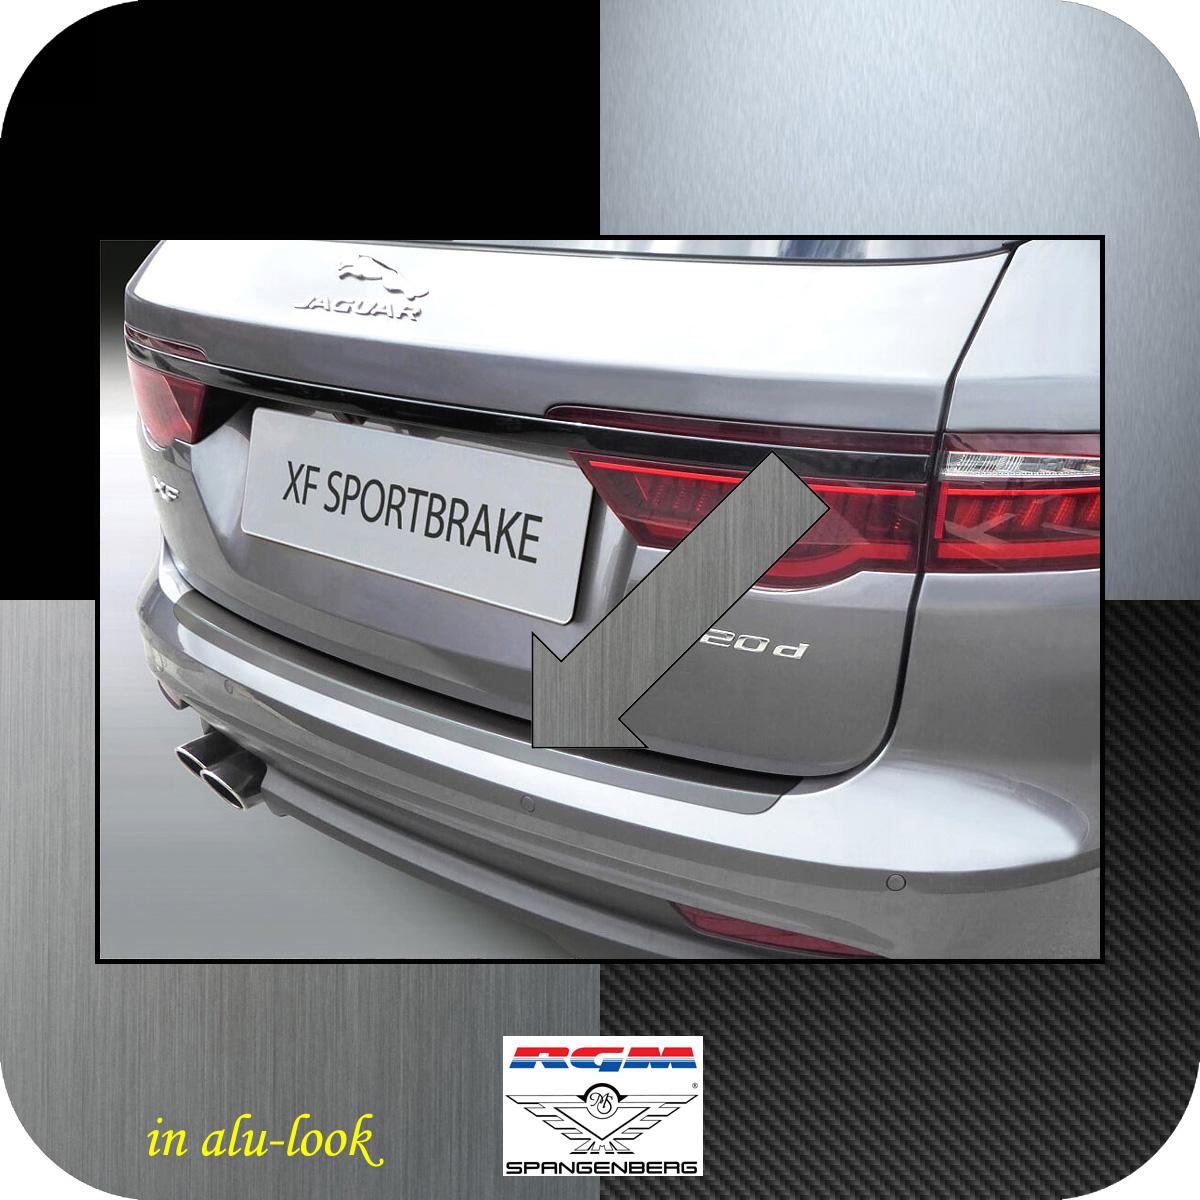 Ladekantenschutz Alu-look Jaguar XF Sportbrake Kombi MK2 ab 07.2017- 3504635